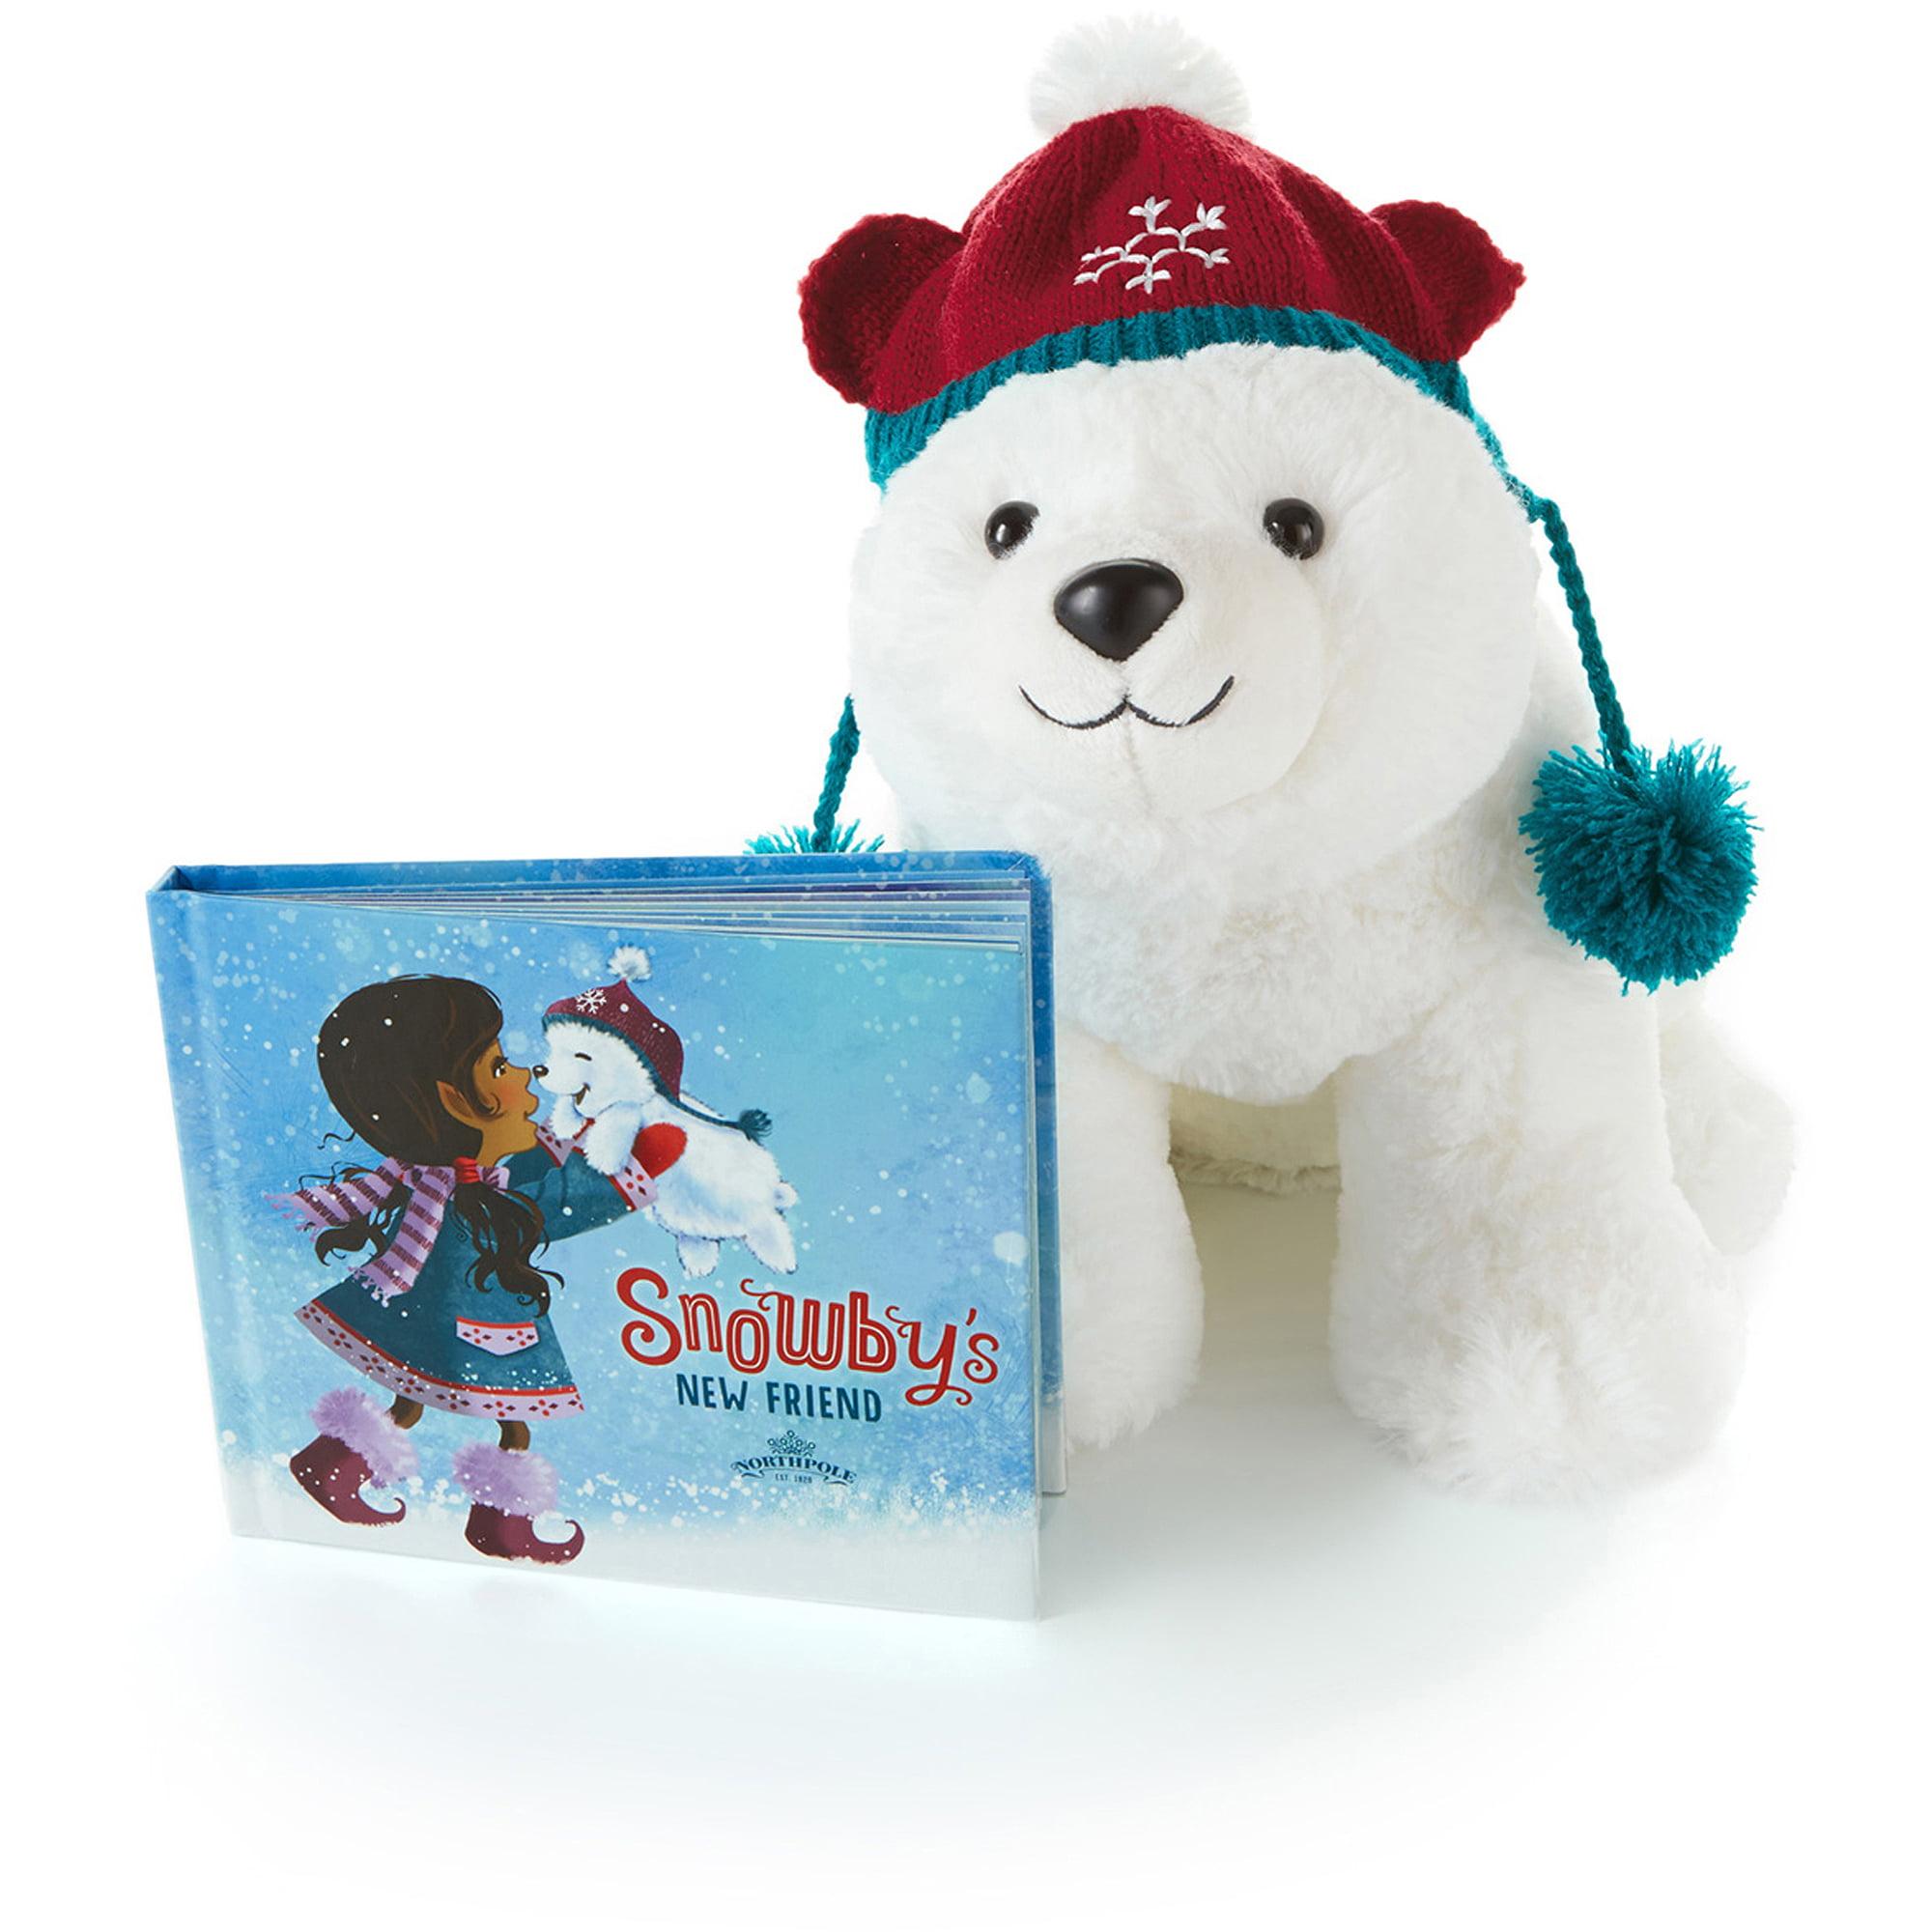 Hallmark Interactive Snowby the Polar Bear and Book, Snowby's New Friend